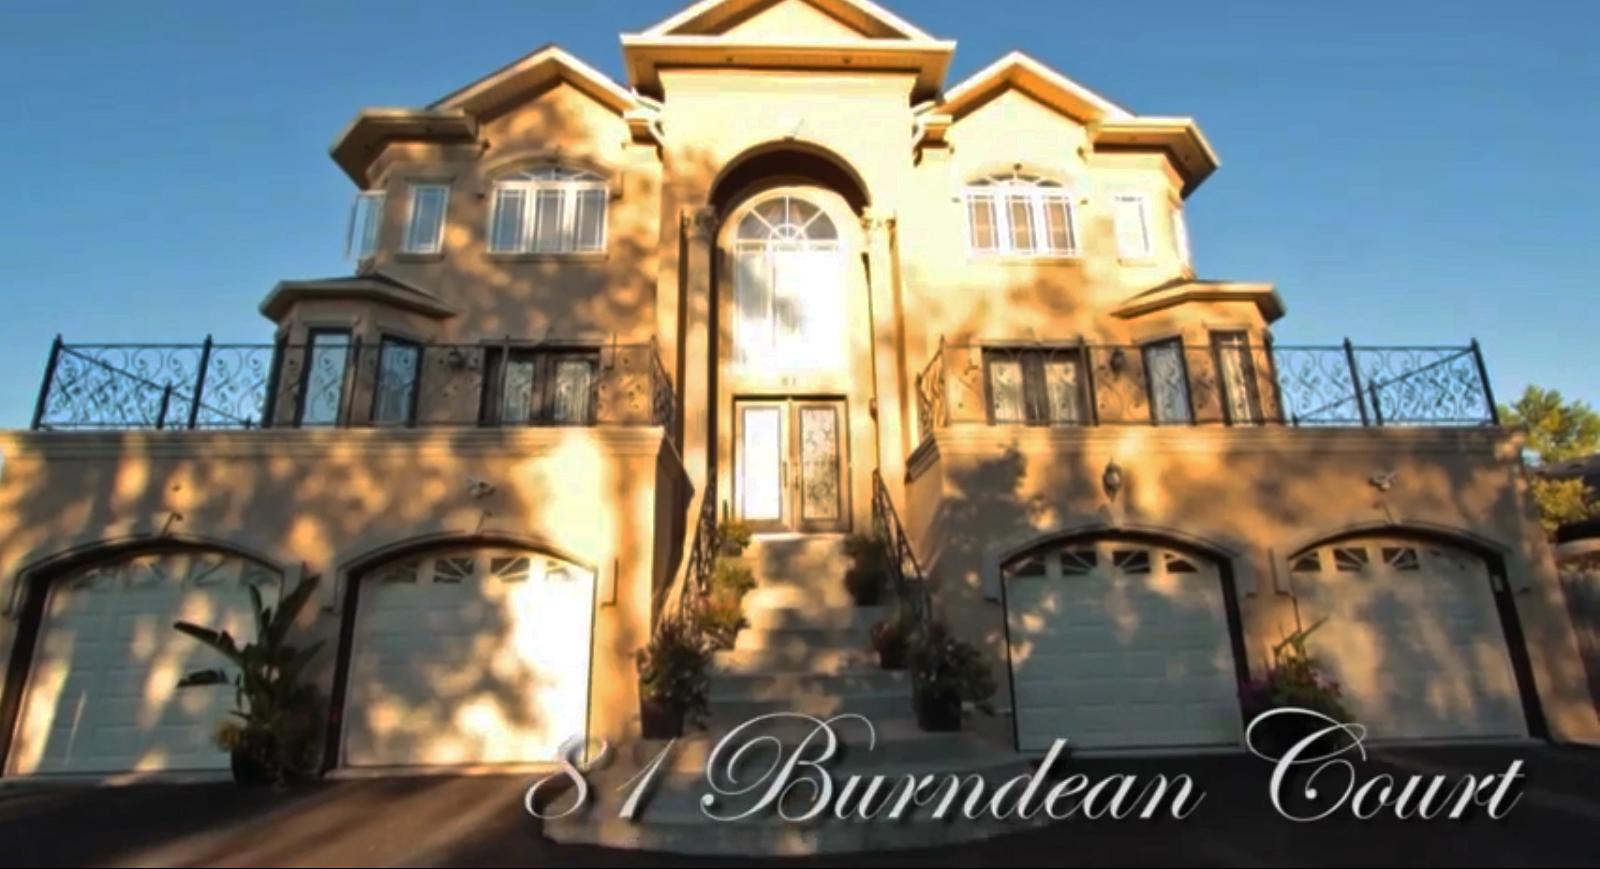 Executive Custom Built Home – 81 Burndean Court